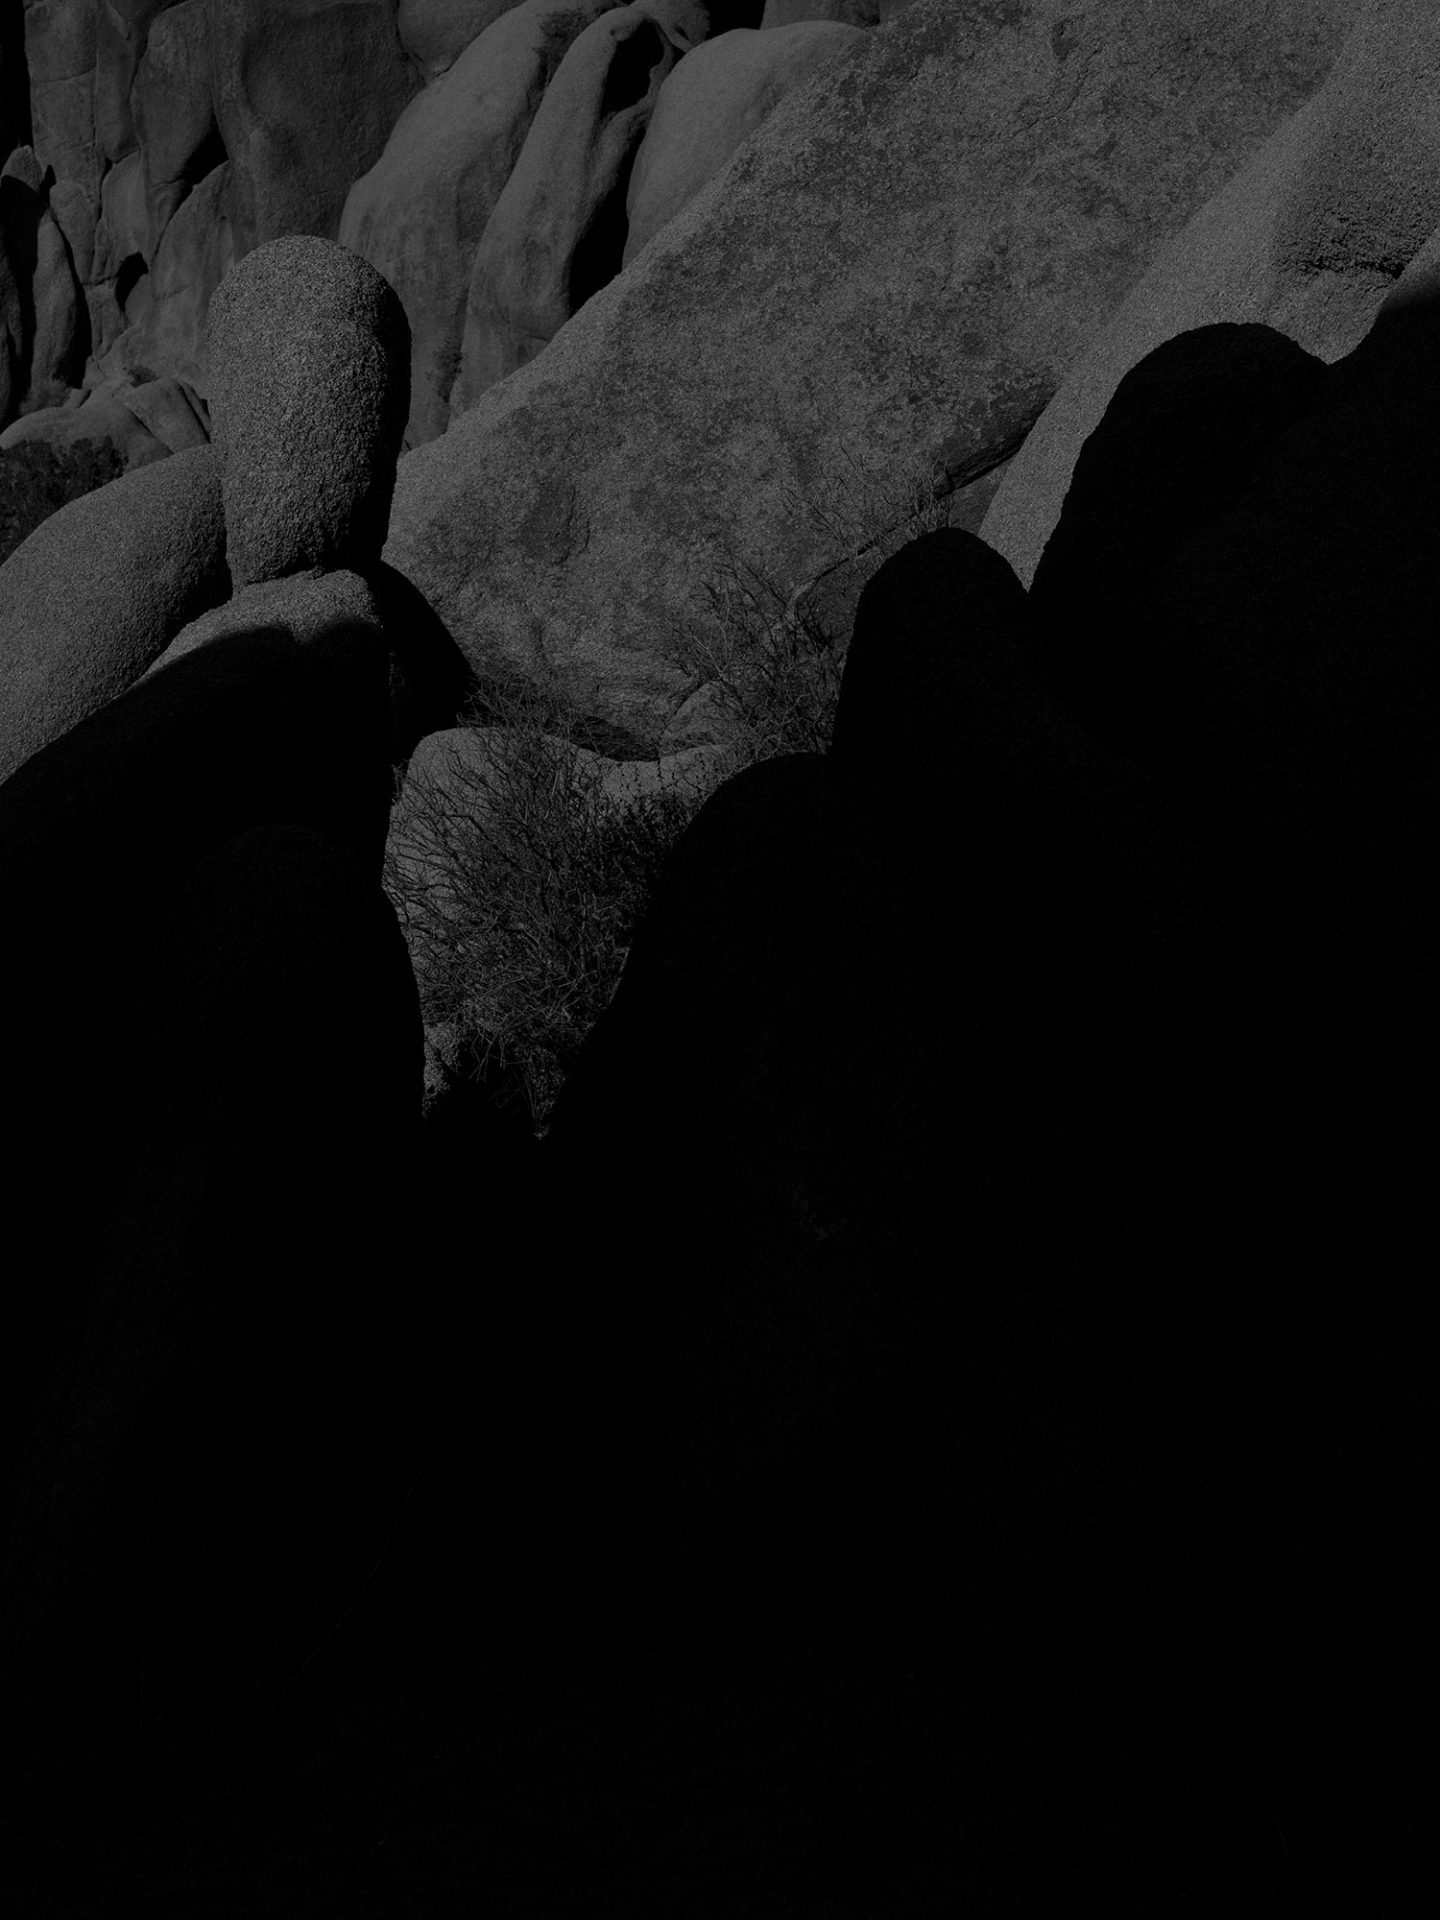 IGNANT-Photography-MarcusSchaefer-16